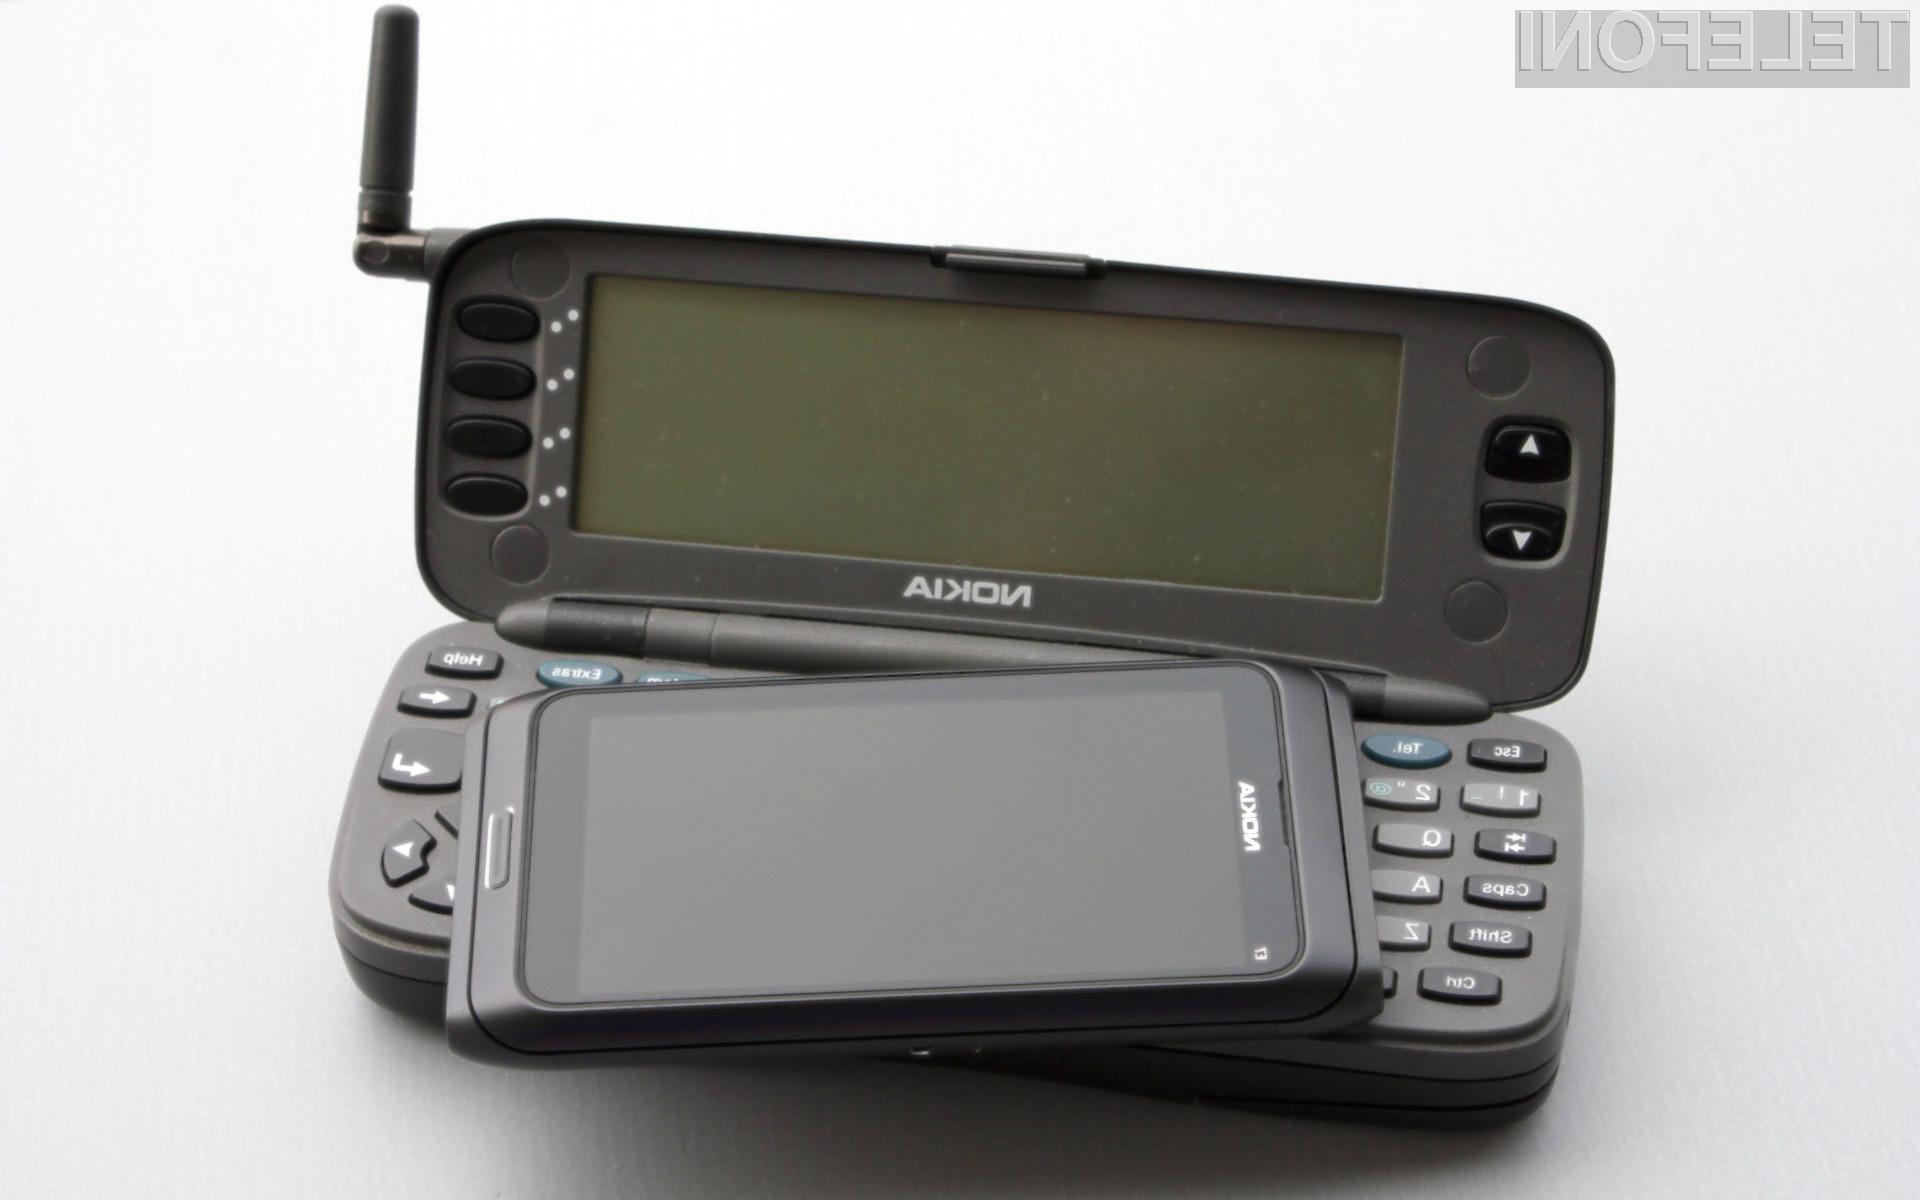 Nokia 9000 Communicator je bil prvi pametni mobilni telefon, namenjen običajnim uporabnikom.